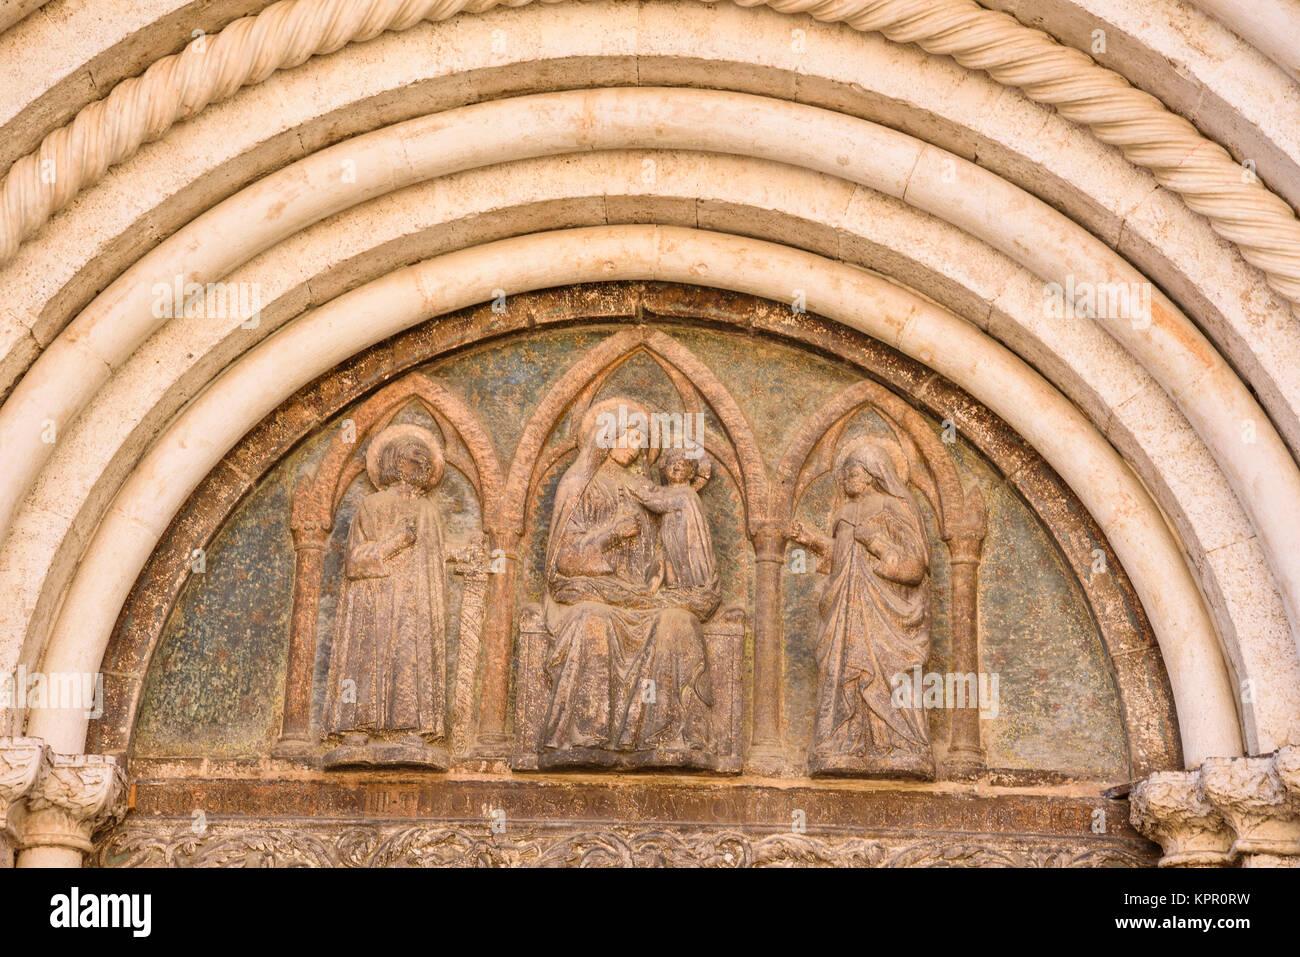 Church doorway, Old Town, Zadar, Croatia - Stock Image